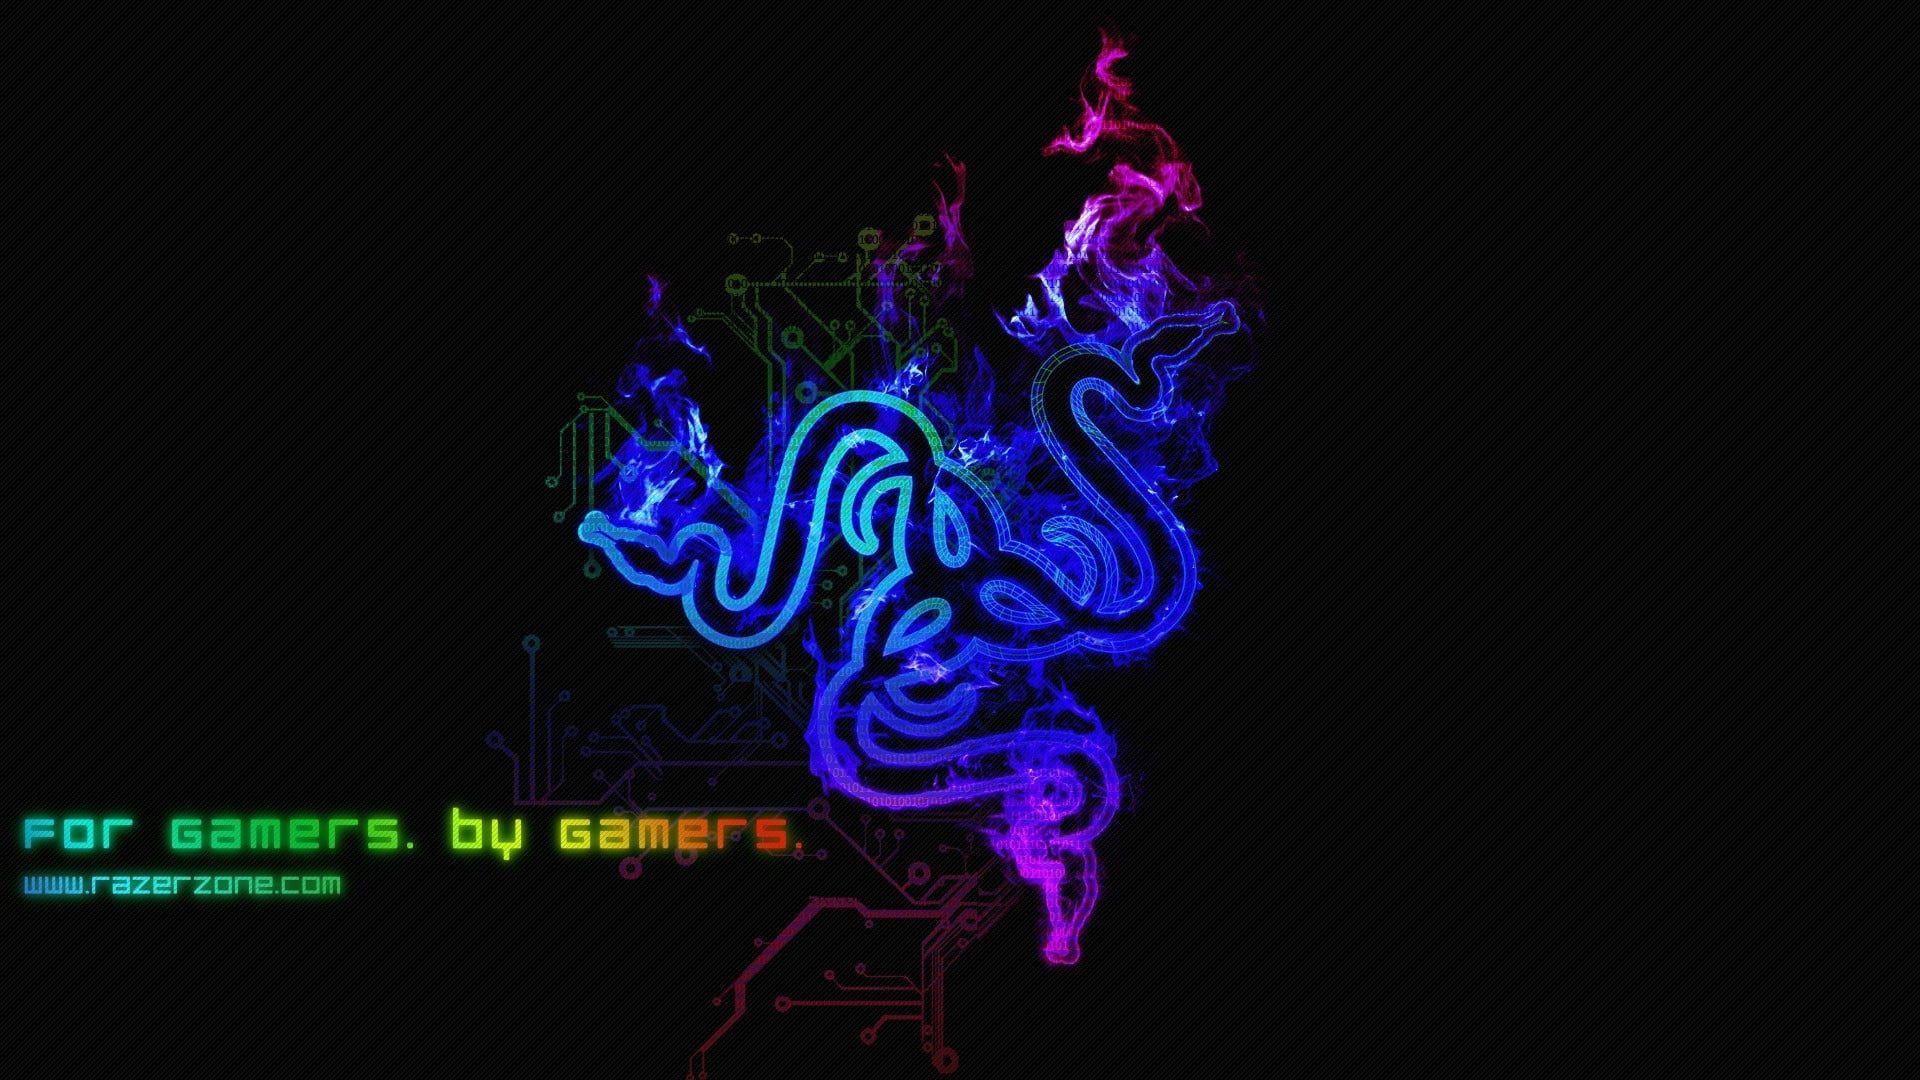 Razer Logo Razer Video Games Pc Gaming Simple Background Simple Colorful 1080p Wallpaper Hdw Gaming Wallpapers Hd Full Hd Wallpaper Game Wallpaper Iphone